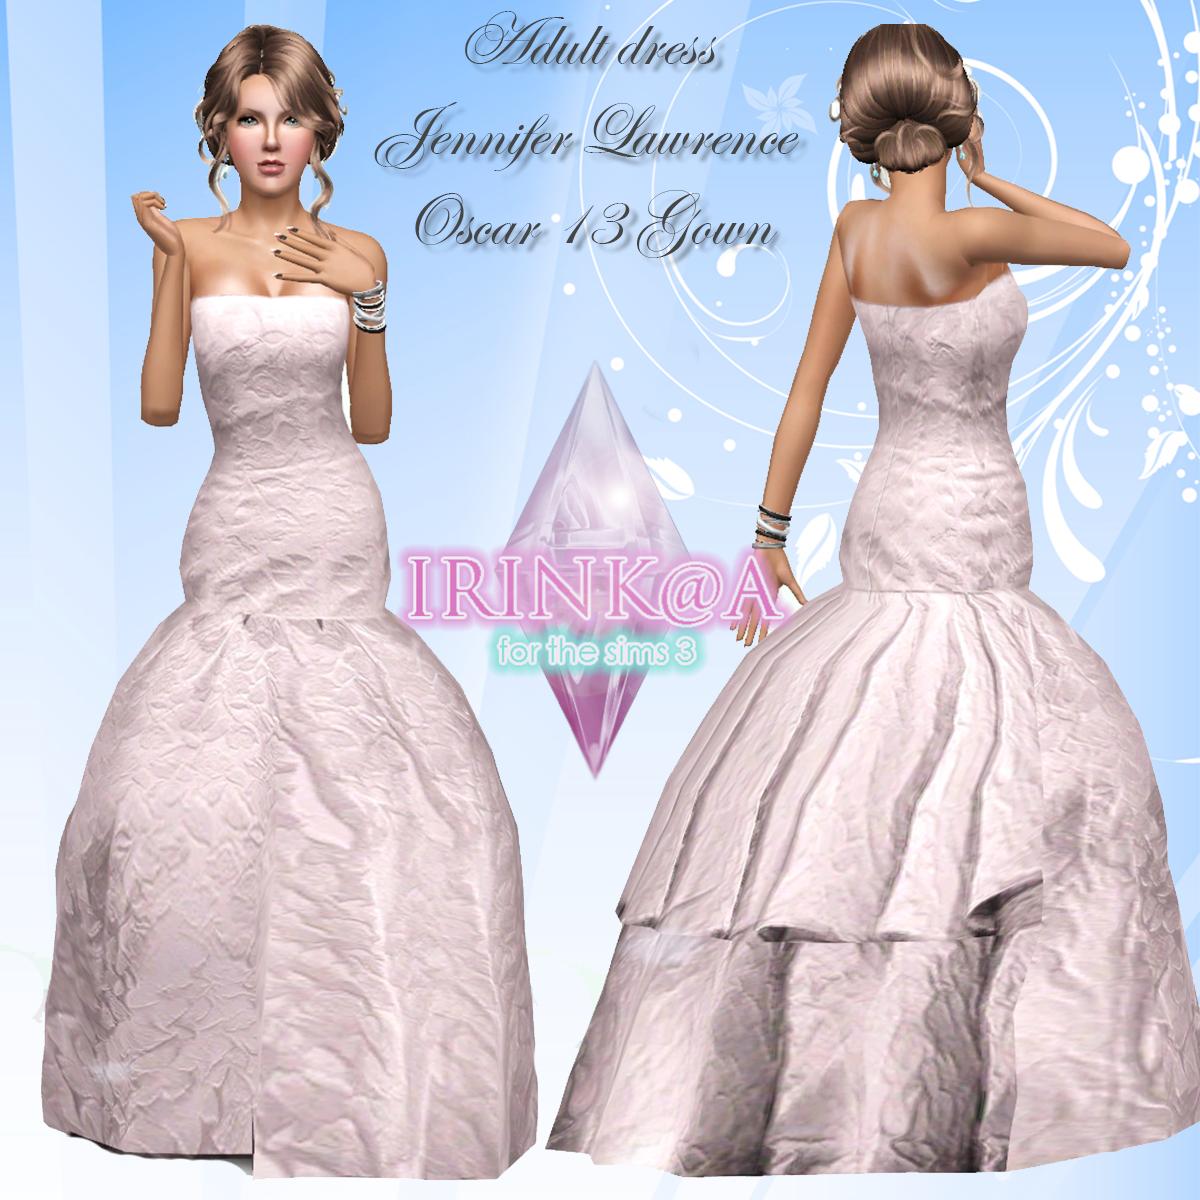 http://2.bp.blogspot.com/-tPVL69Mejag/UTi1PpbtLiI/AAAAAAAABi4/OLsfKjQcAGE/s1600/Adult+dress+Jennifer+Lawrence+Oscar+13+Gown+by+Irink@a.png